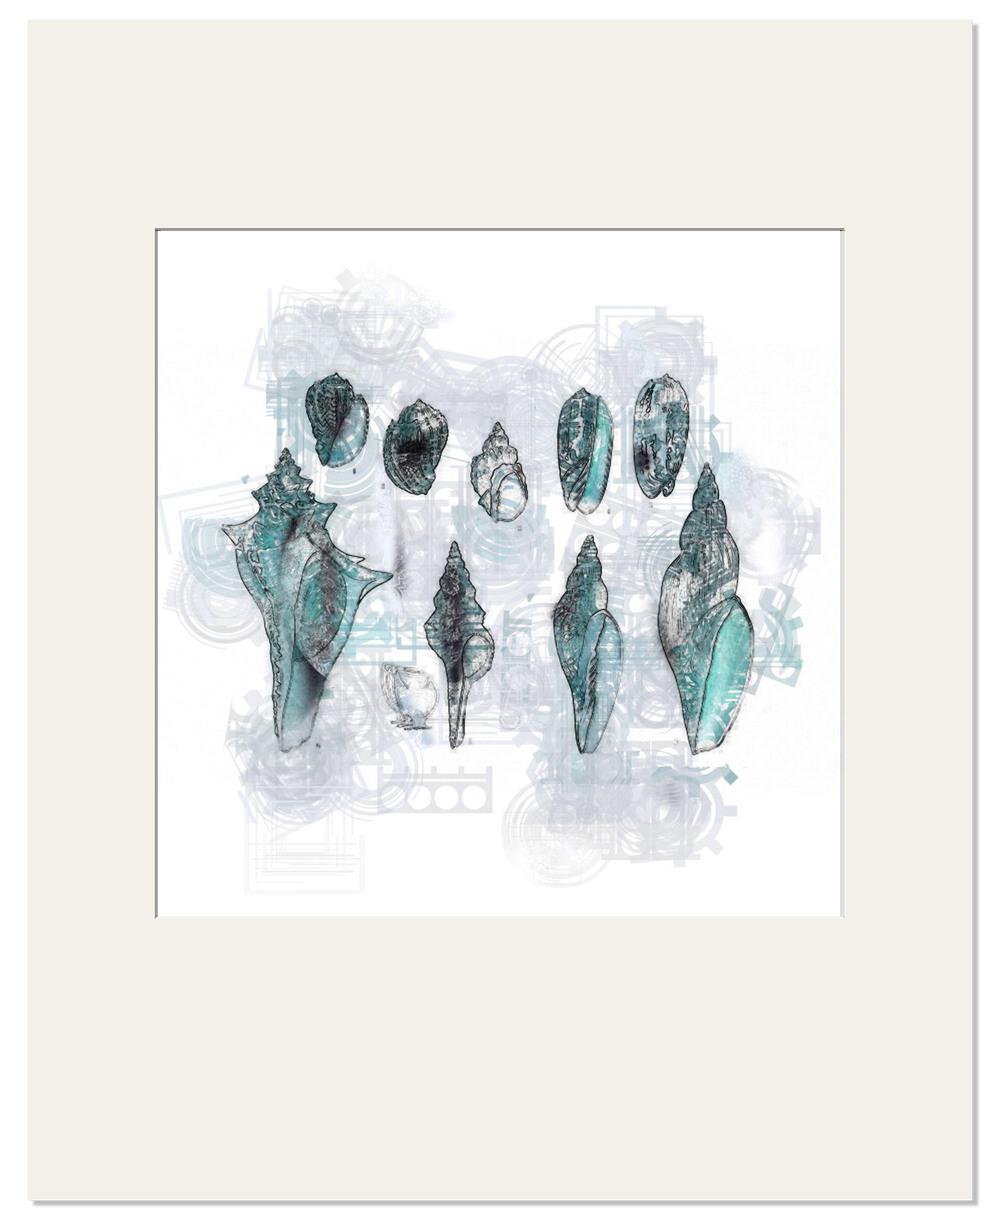 aquatic-print-8.jpg